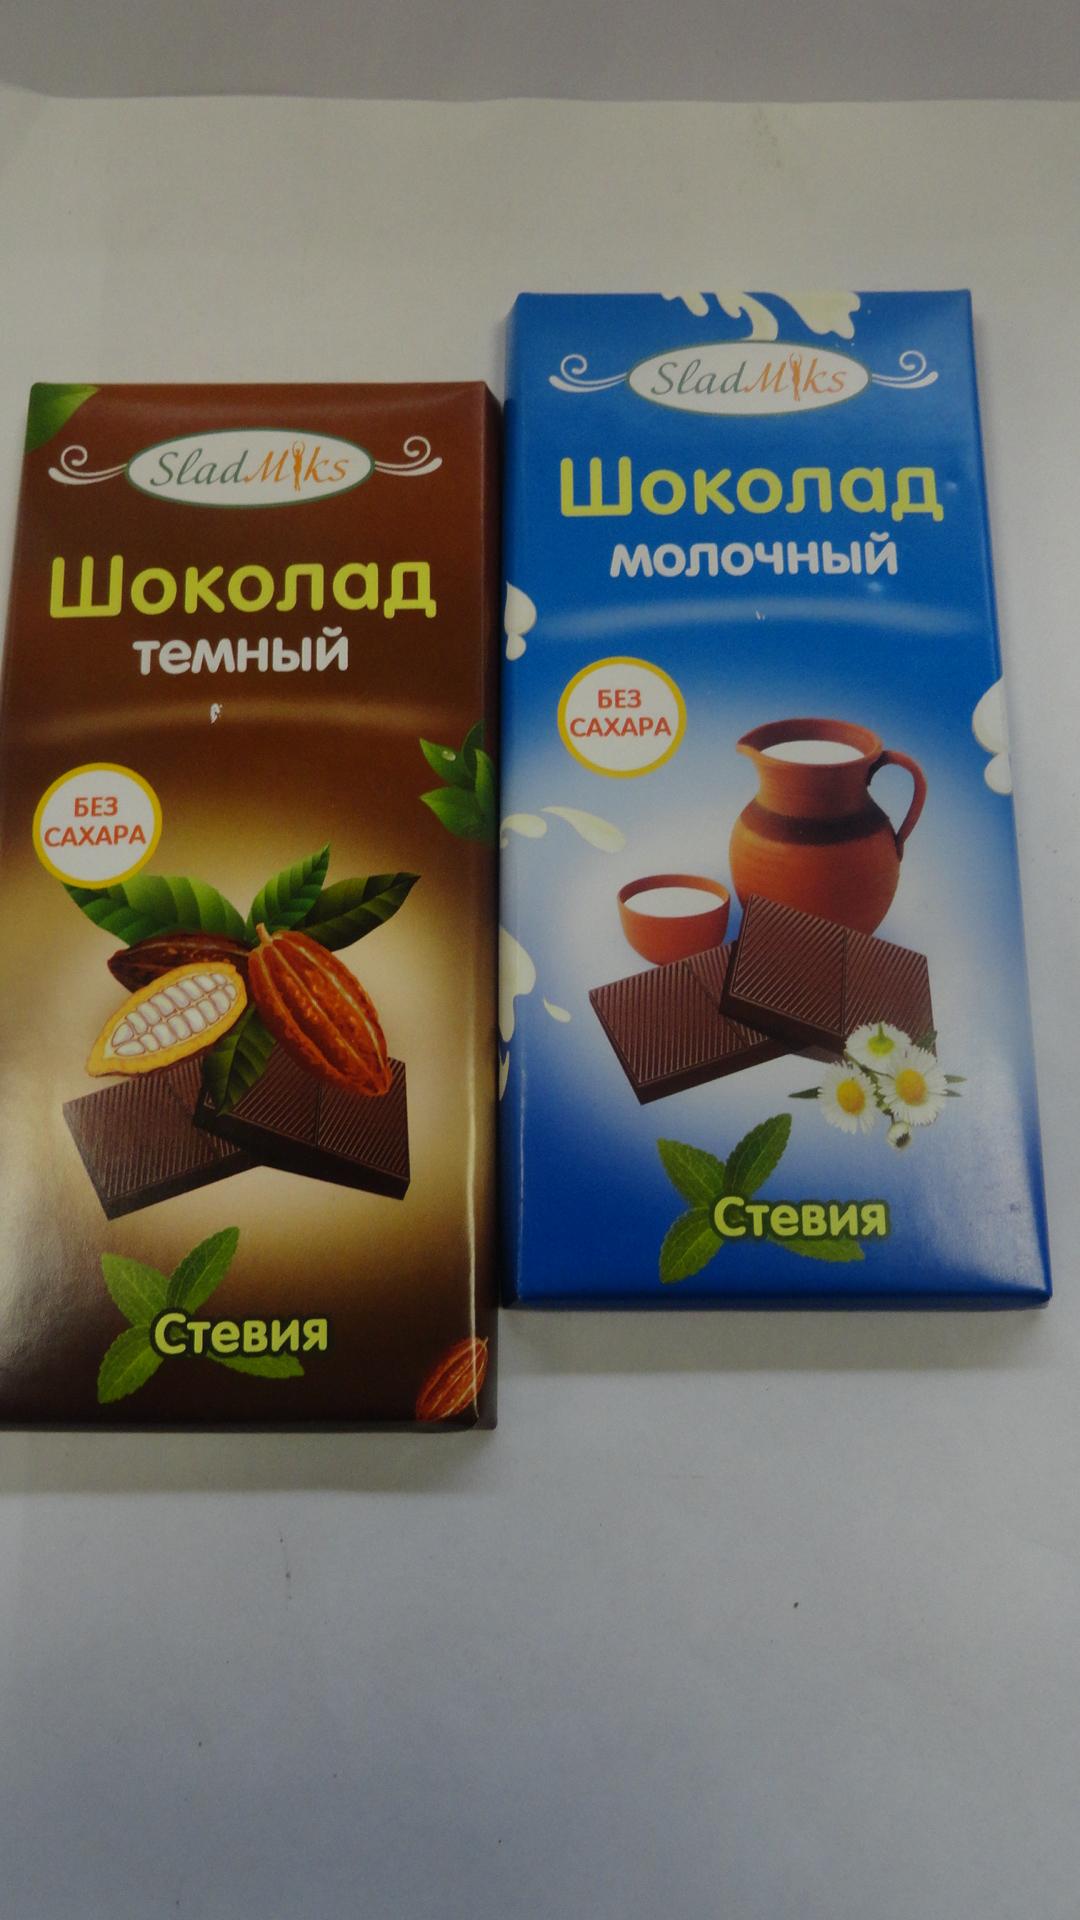 Шоколад горький на фруктозе при сахарном диабете